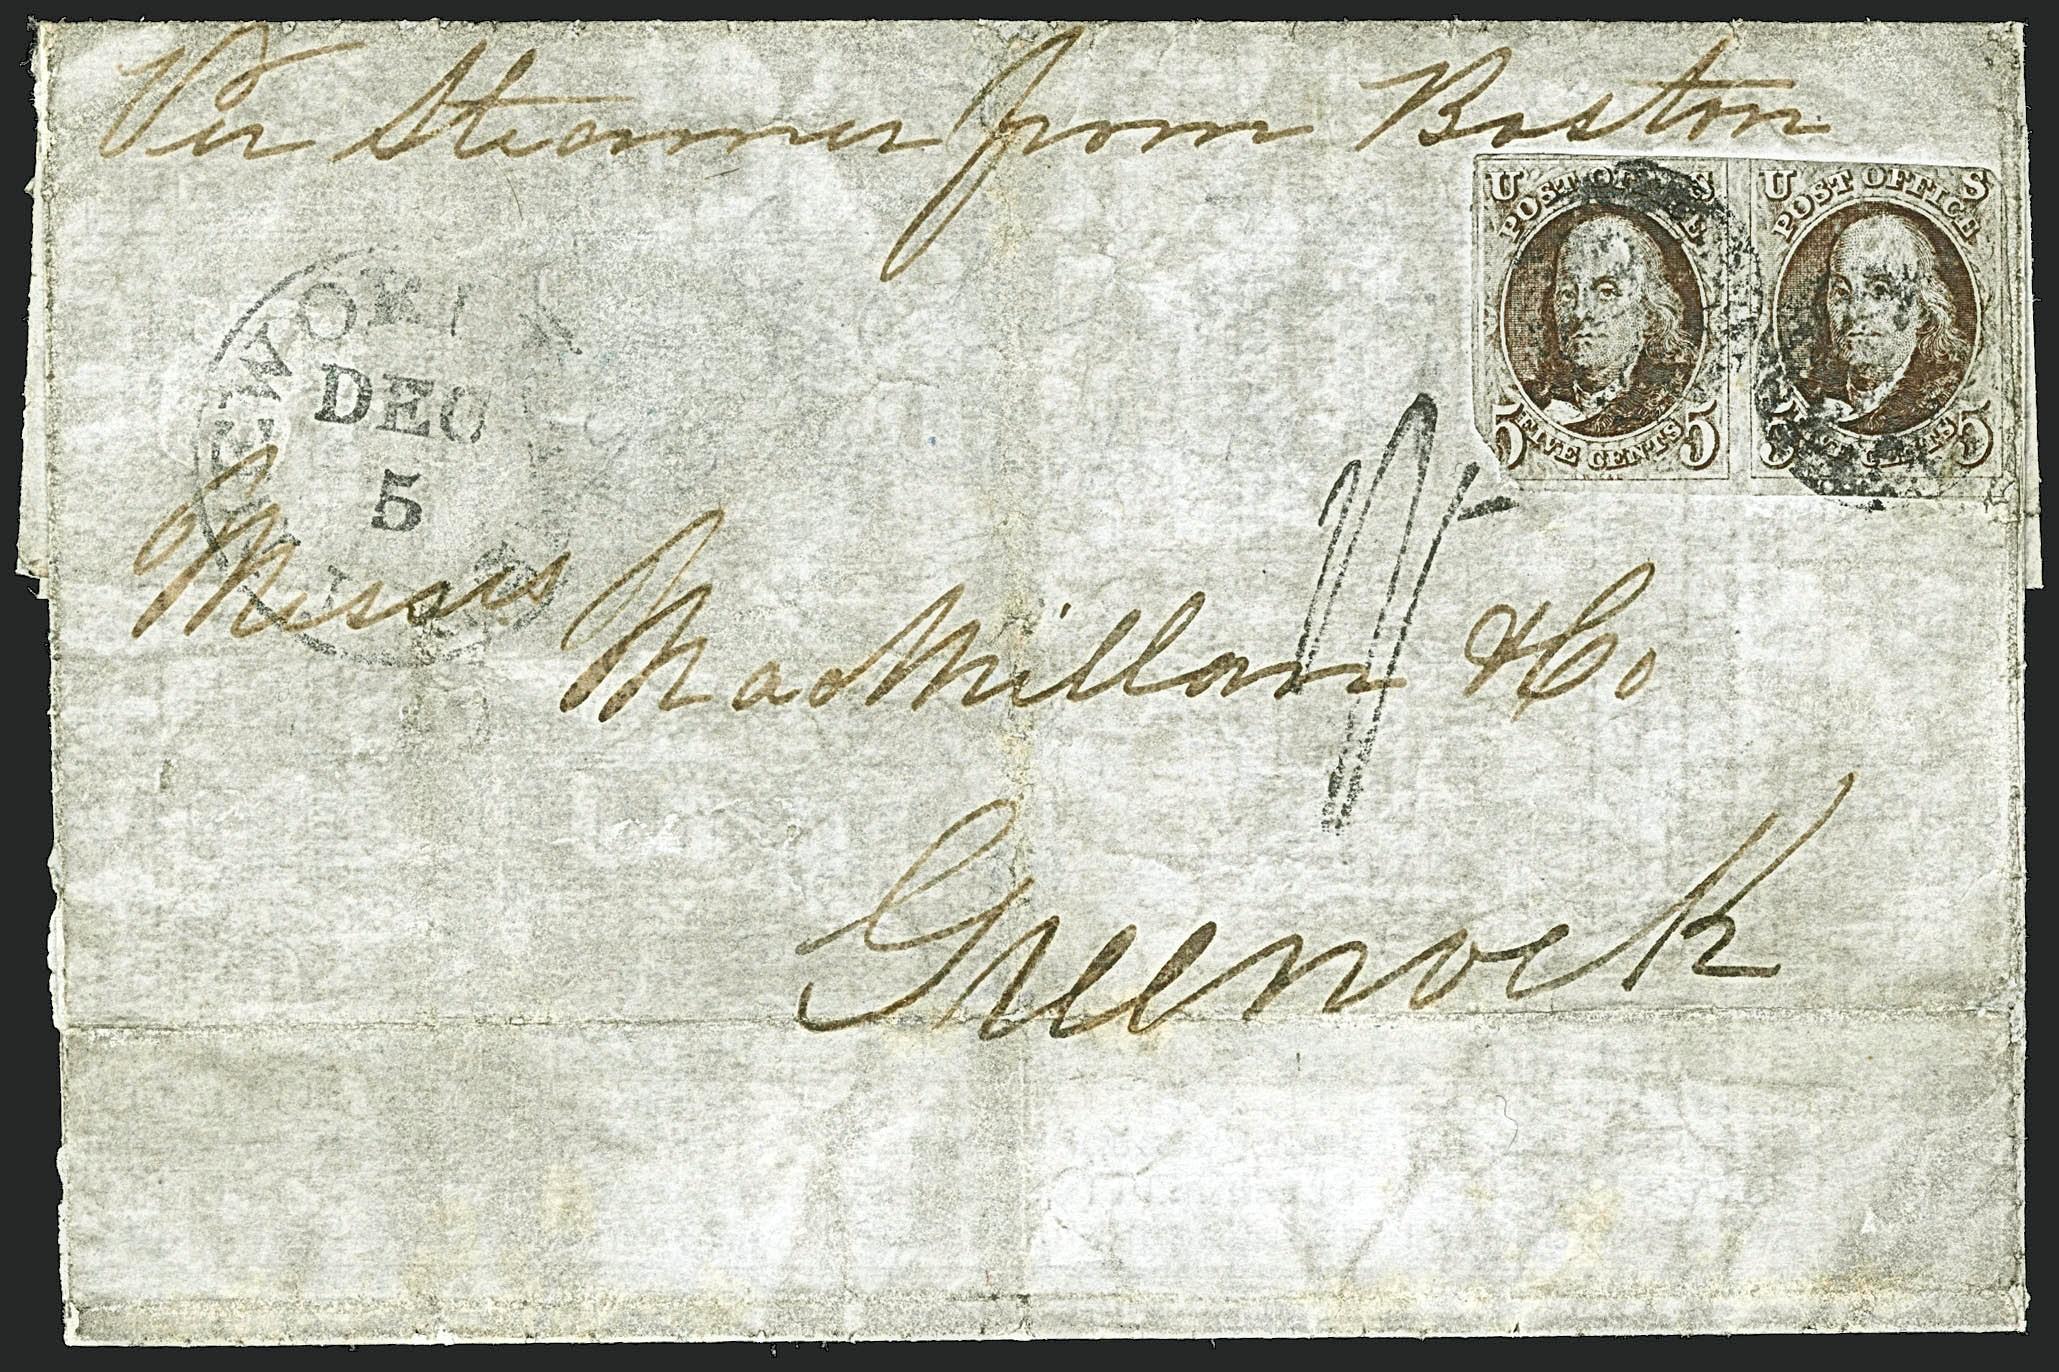 ID 1676, Image ID 25277